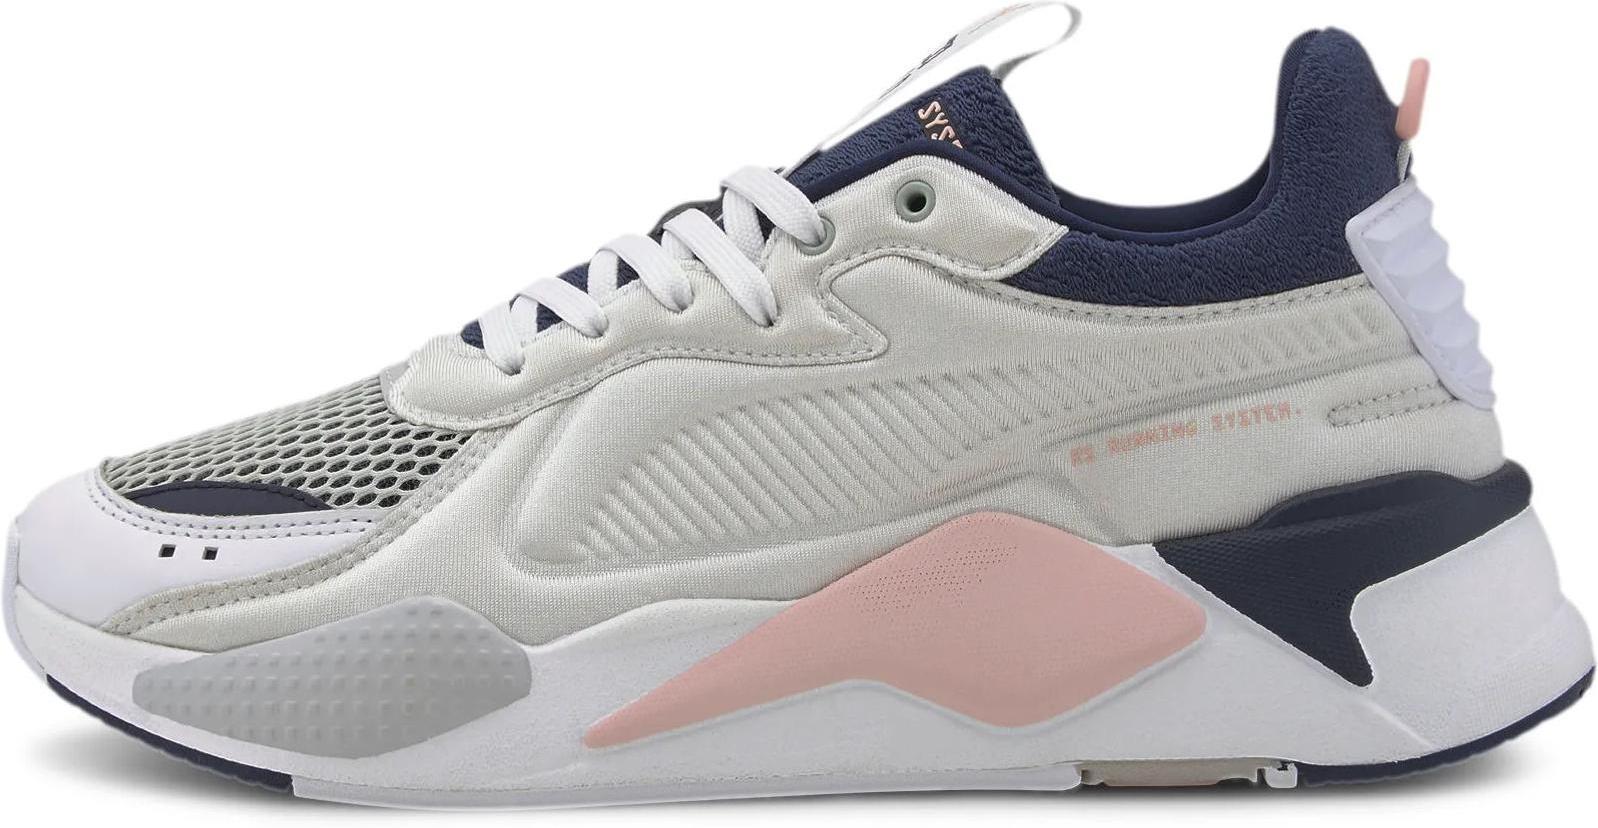 Shoes Puma RS-X SOFTCASE - Top4Running.com